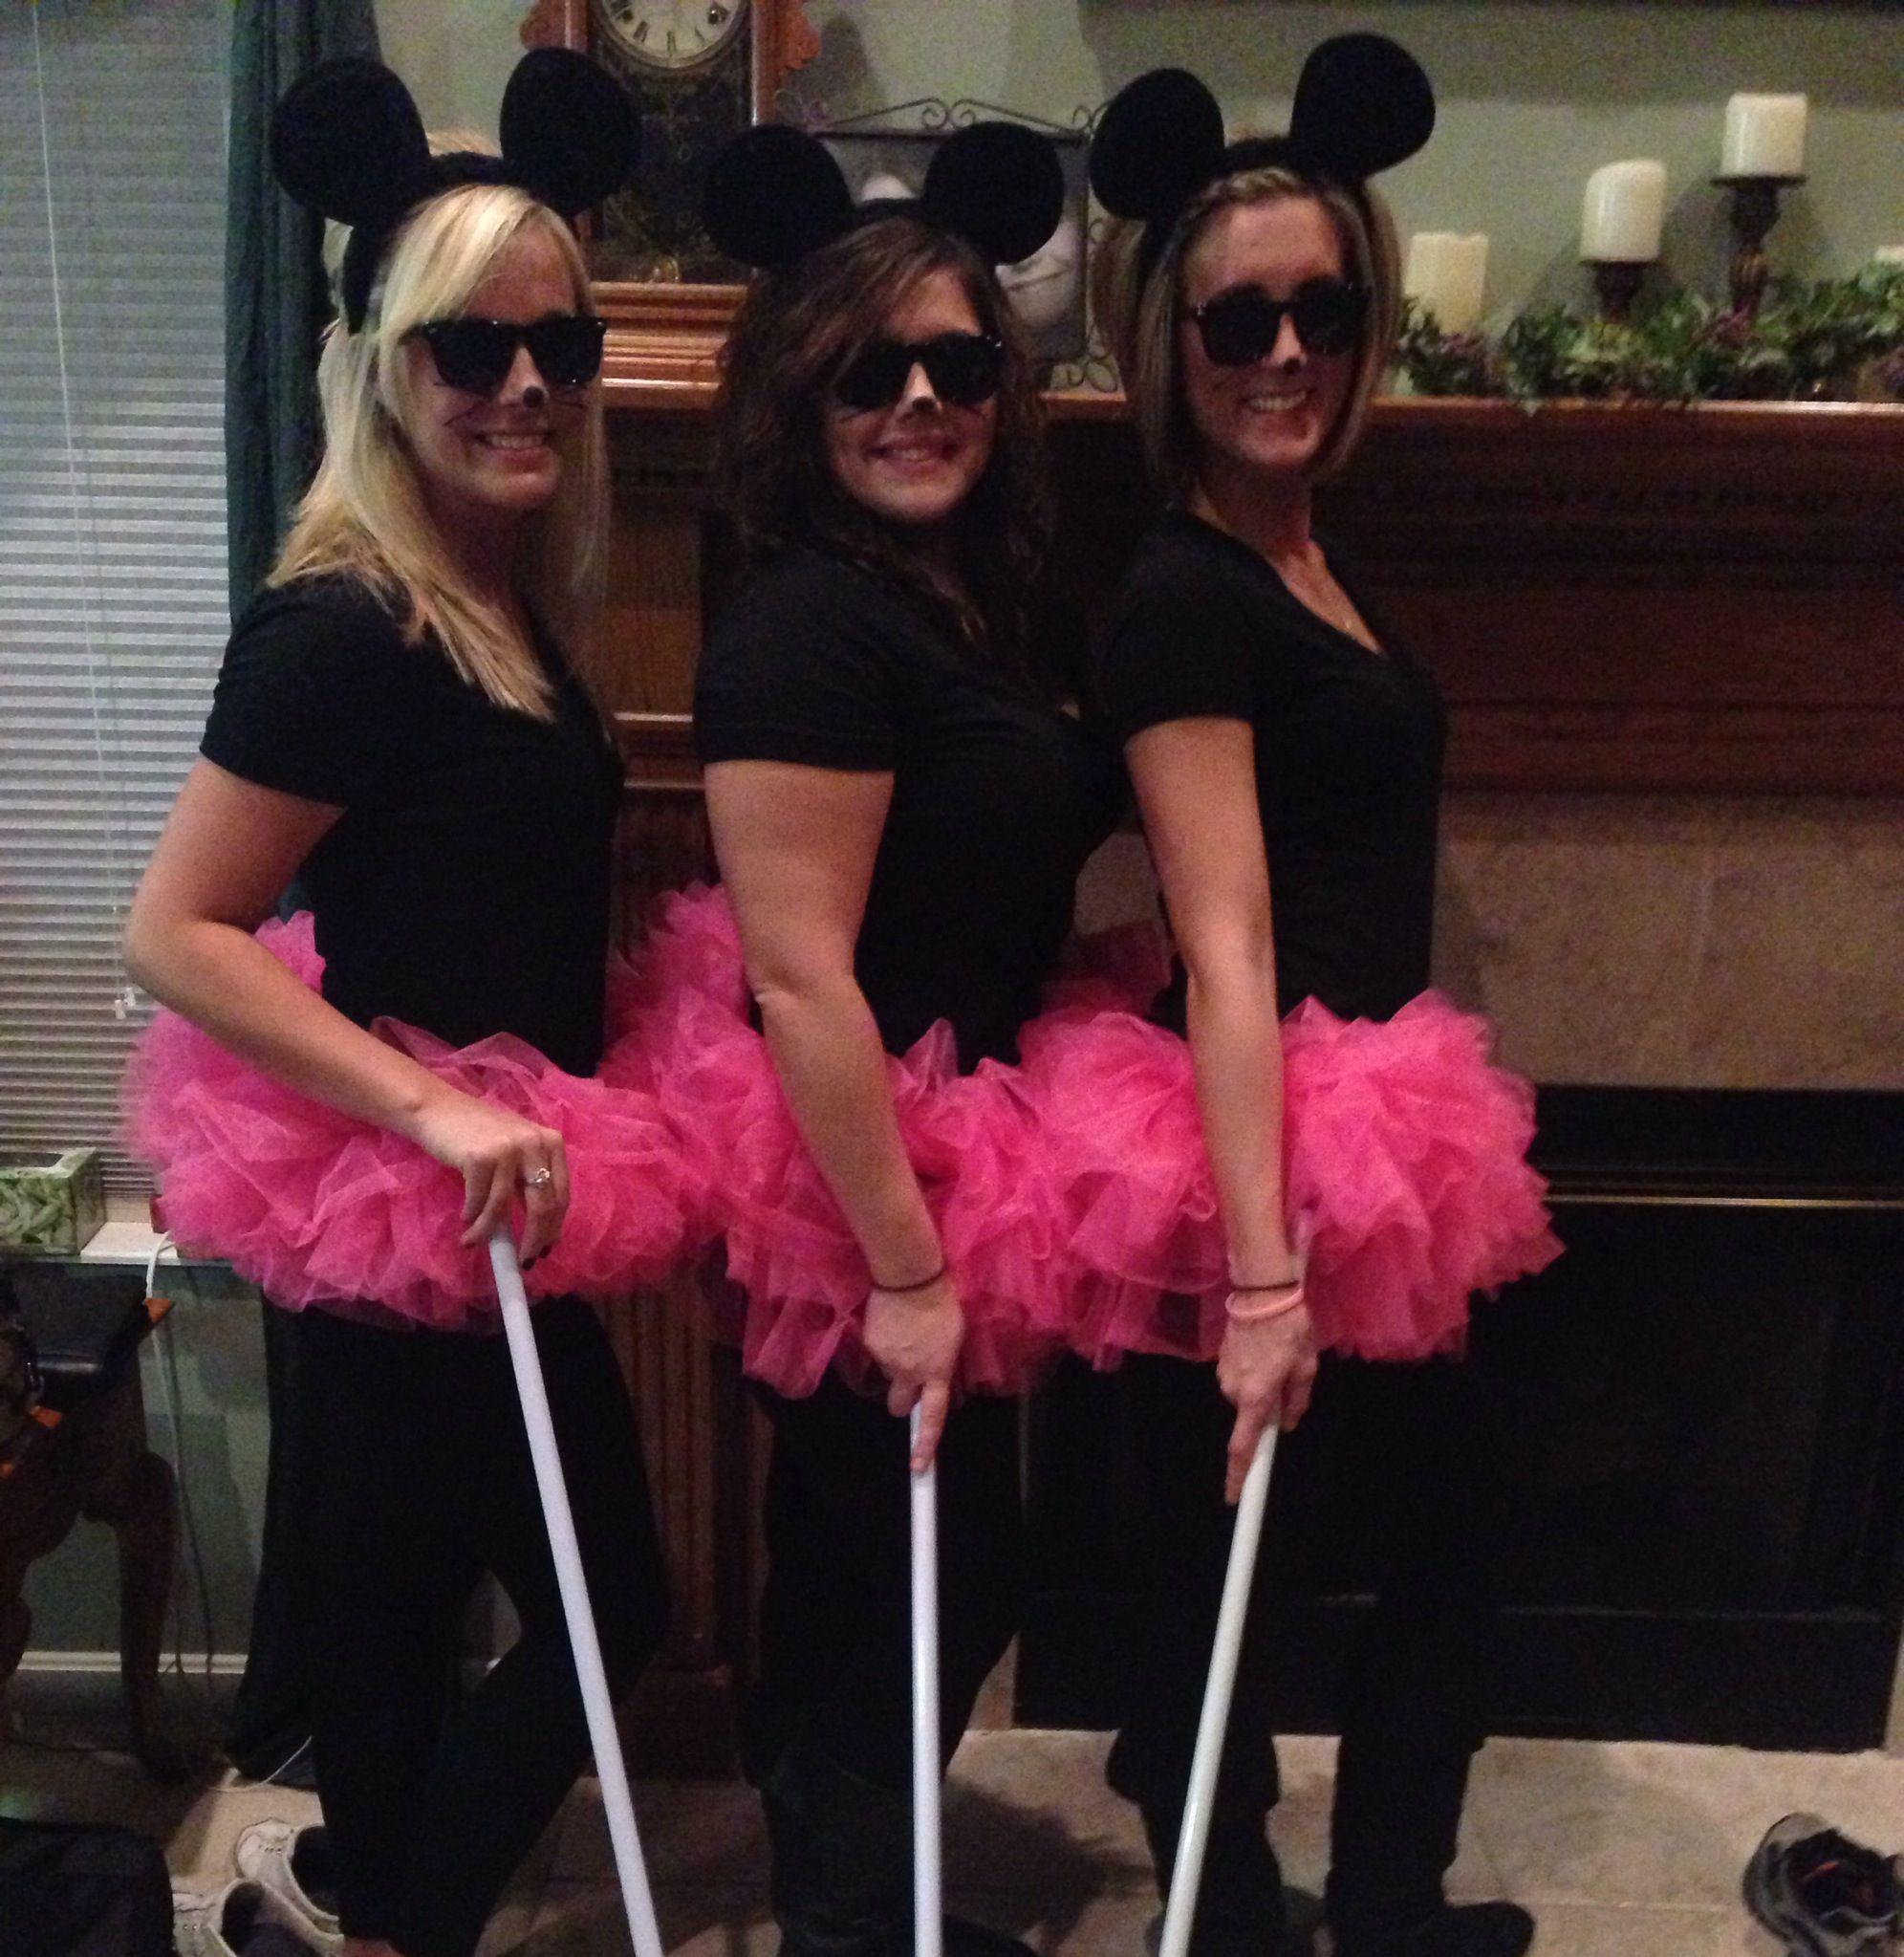 Three blind mice )  sc 1 st  Pinterest & Three blind mice :) | Three blind mice :) | Pinterest | Mice ...